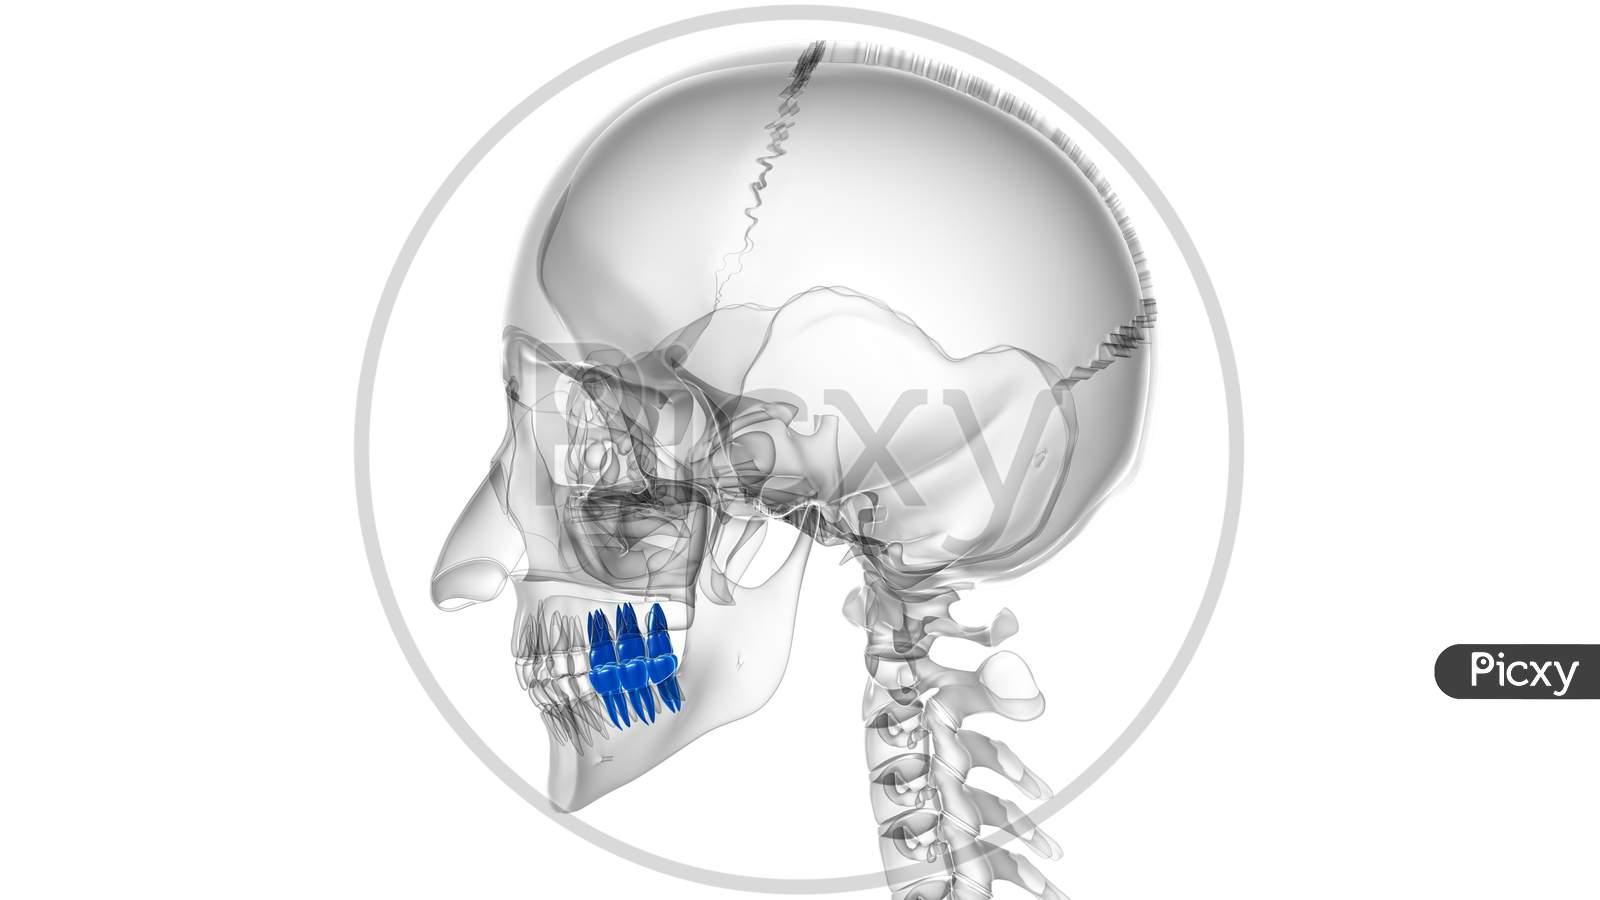 Human Teeth Molars Anatomy 3D Illustration